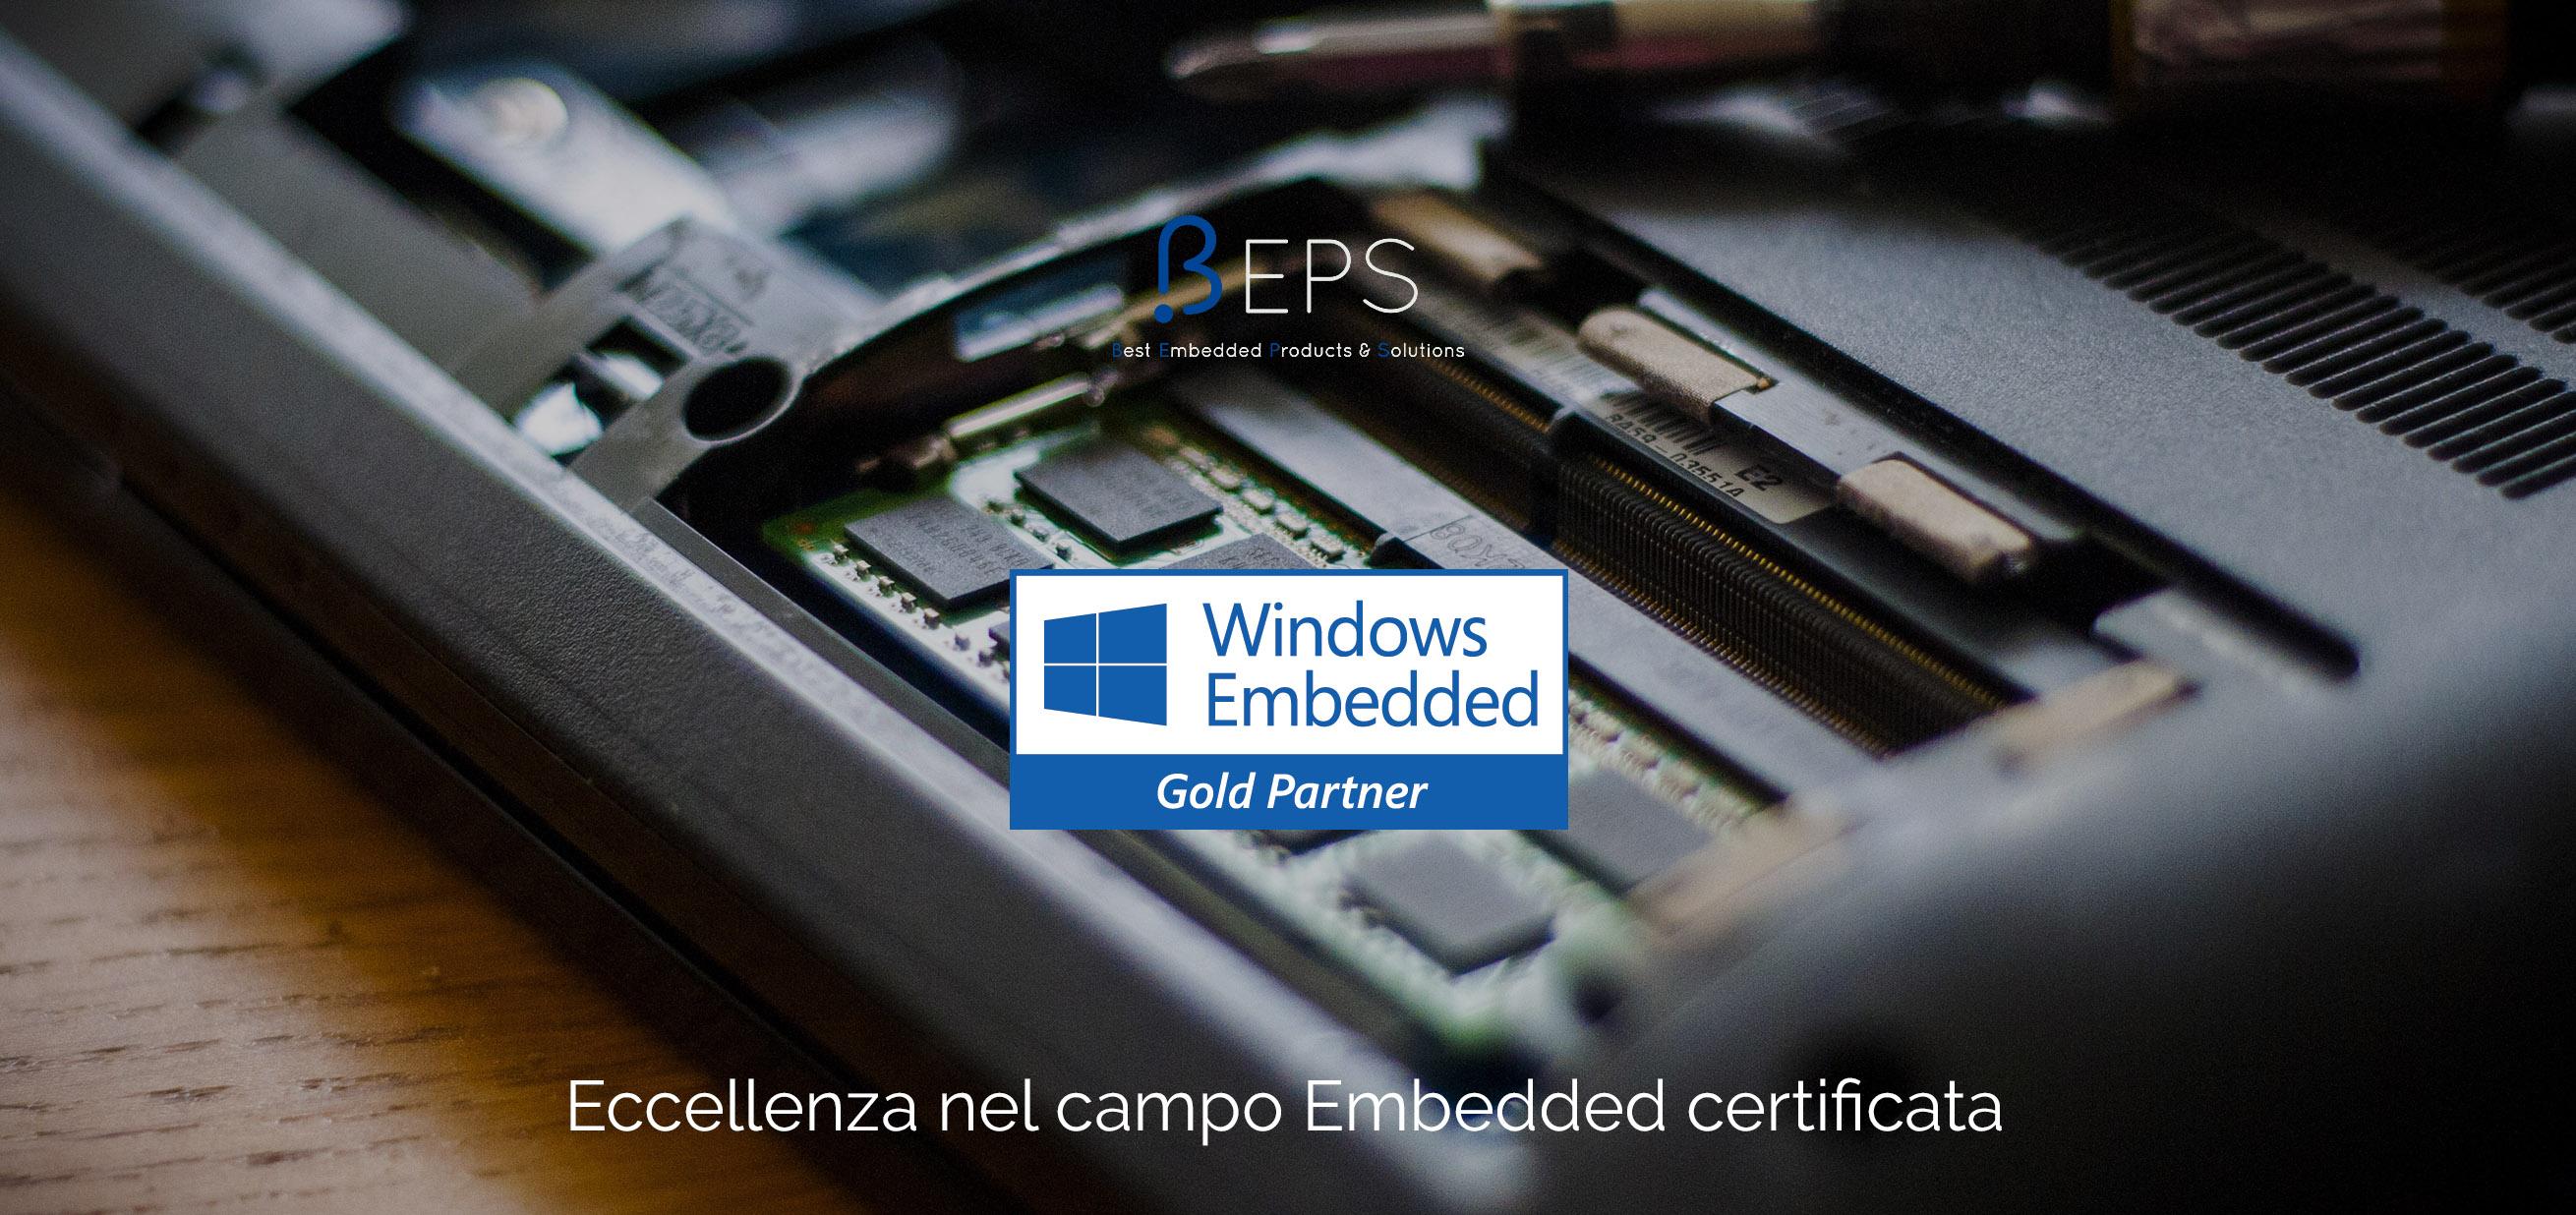 Beps Gold partner microsoft embedded iot